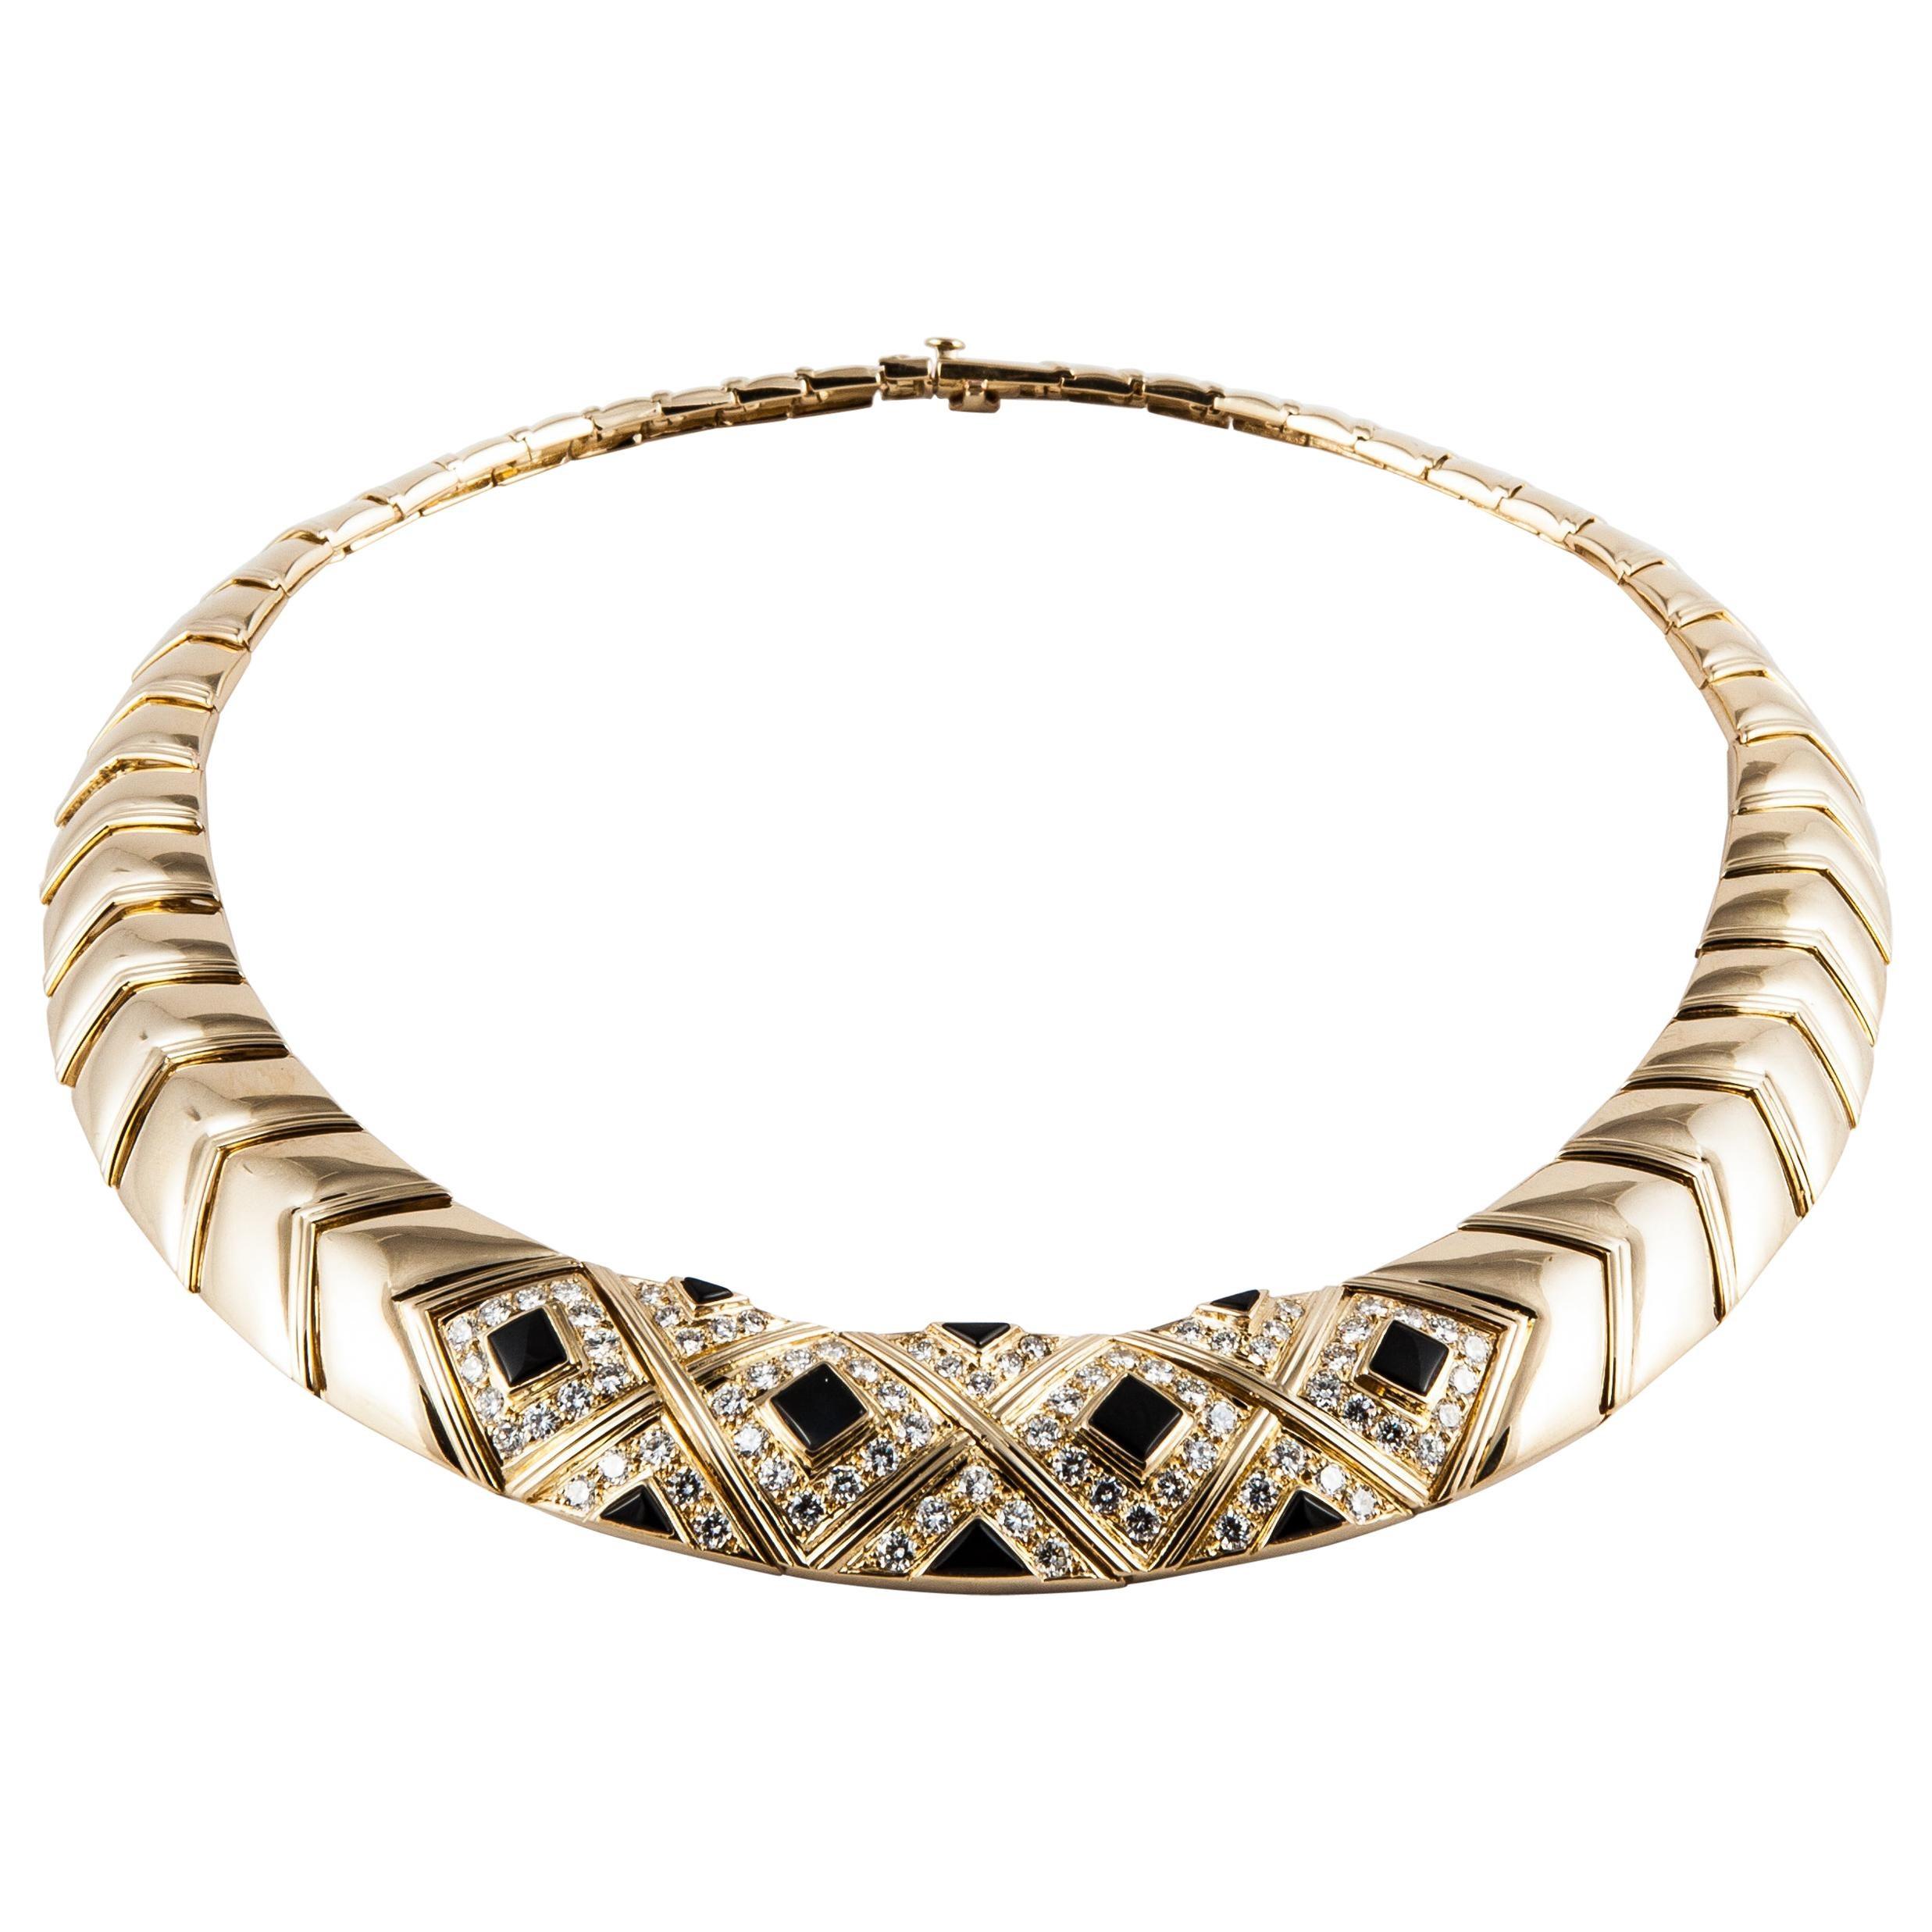 Van Cleef & Arpels Onyx and Diamond Collar Necklace